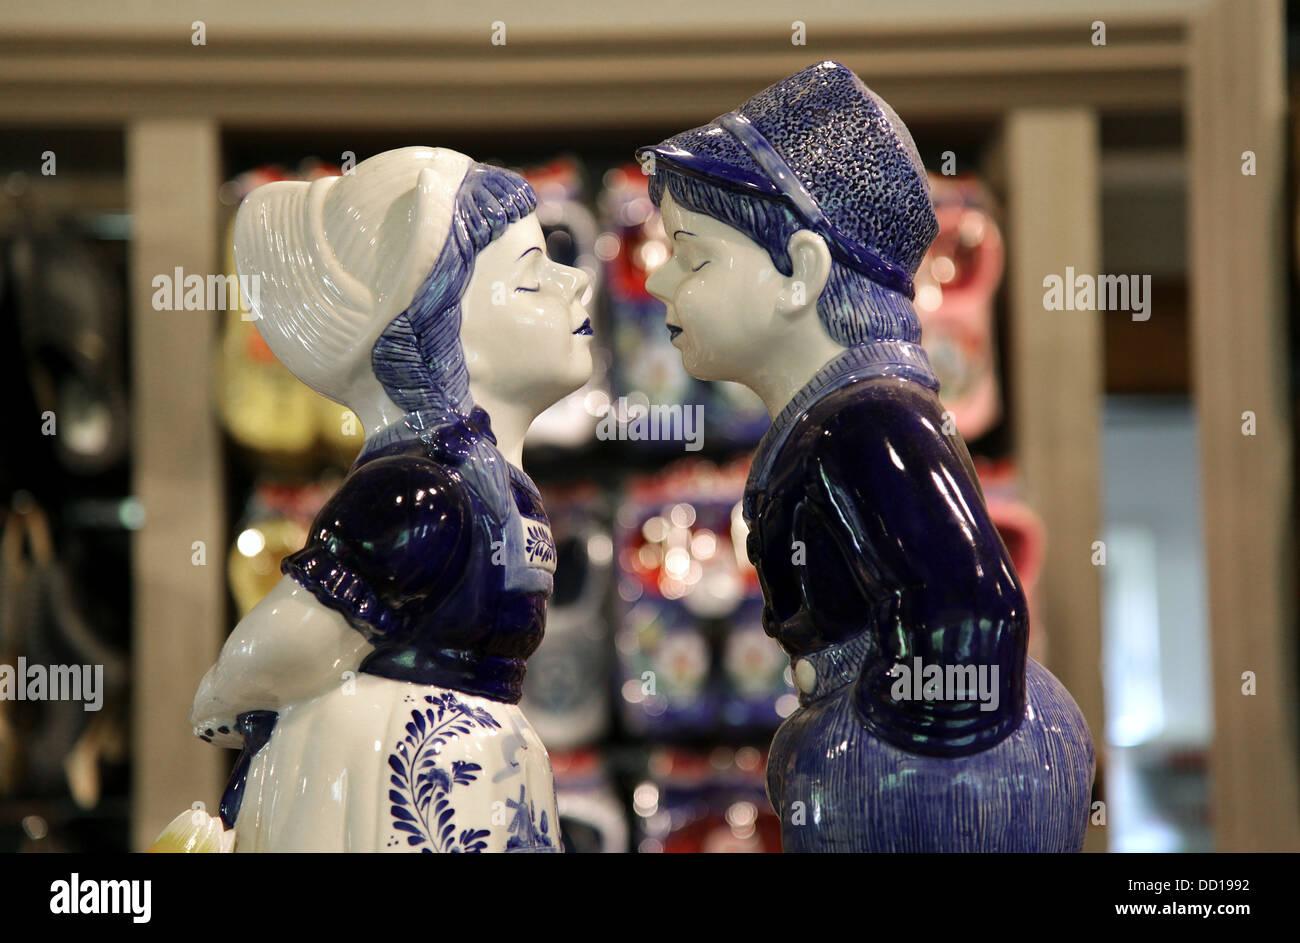 Love Puppets.Dutch folklore.Delft pottery.Delft ware.Delft blue.Netherlands. - Stock Image